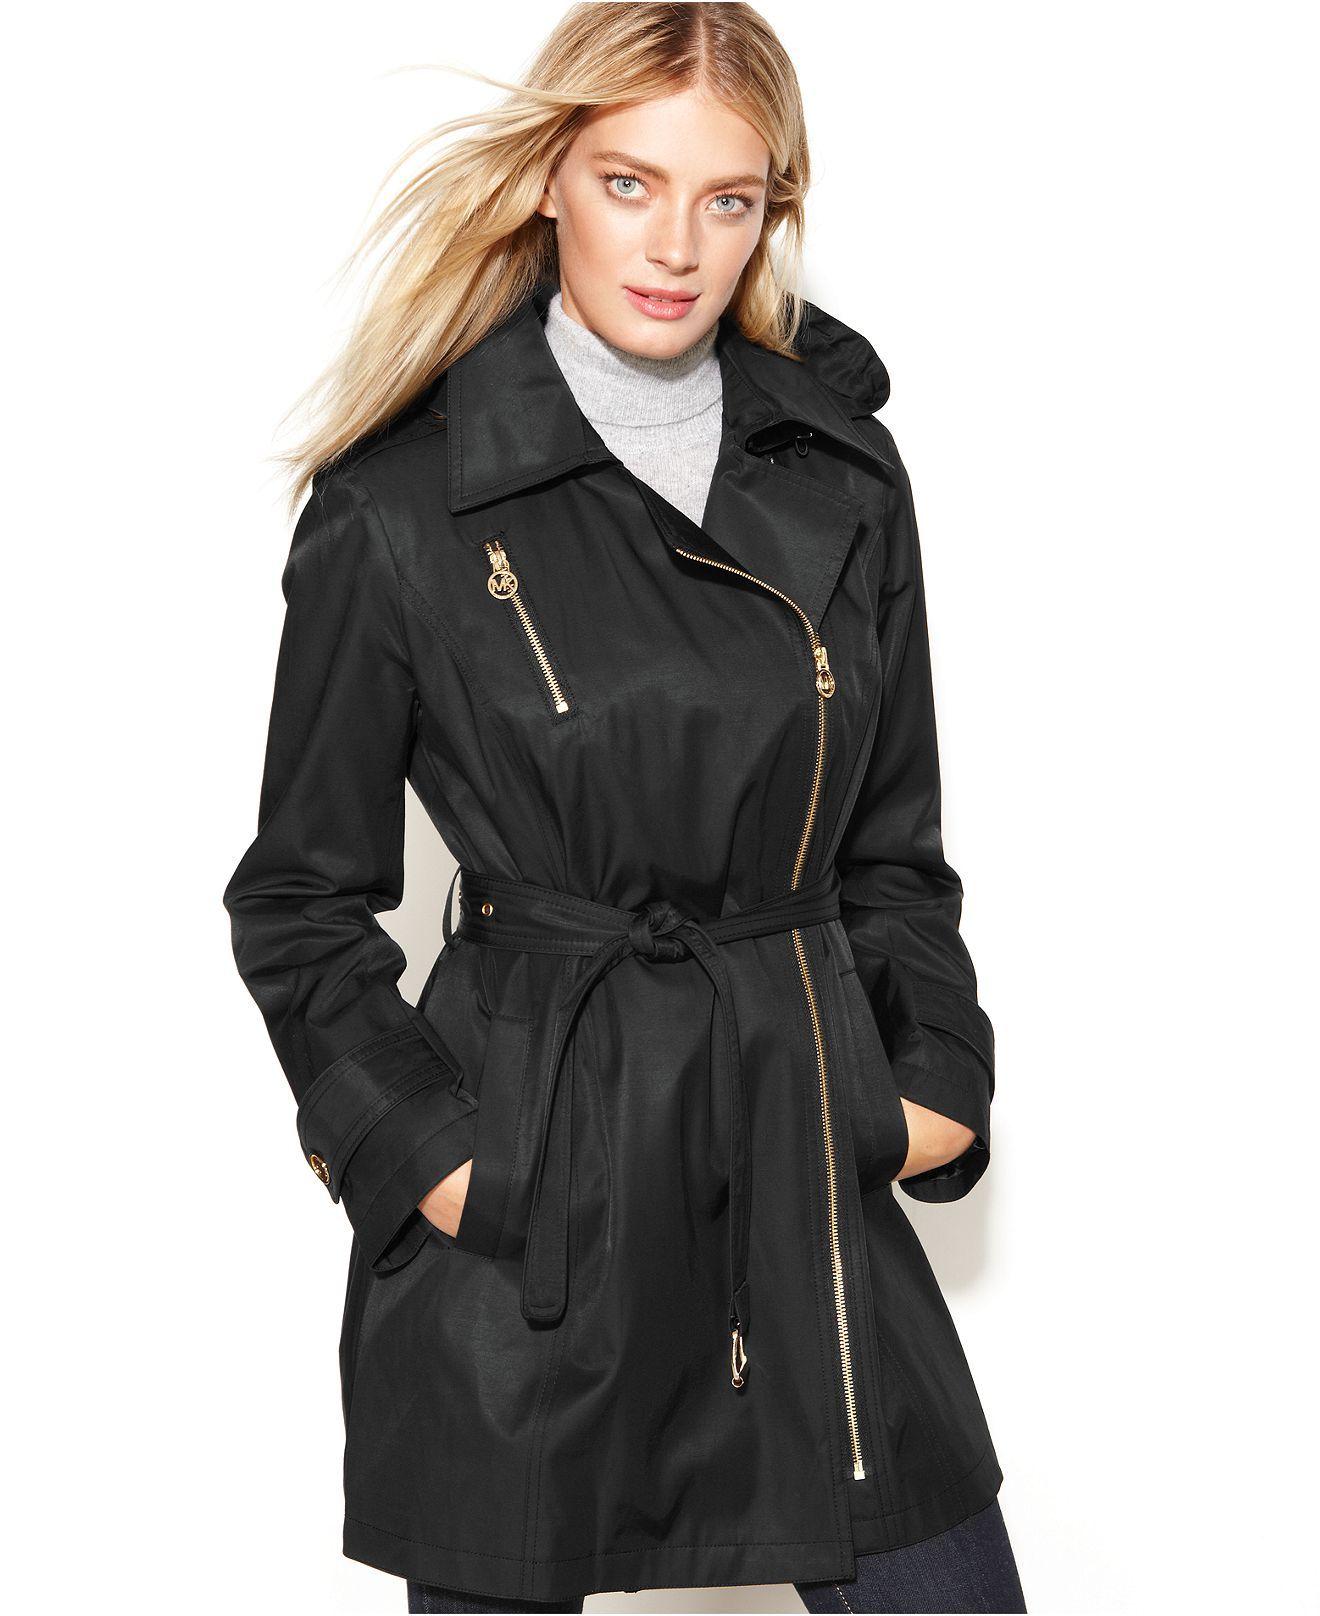 Michael Michael Kors Coat Asymmetrical Hooded Belted Trench Coats Women Macy S Michael Kors Coats Coats Jackets Women Trench Coats Women [ 1616 x 1320 Pixel ]